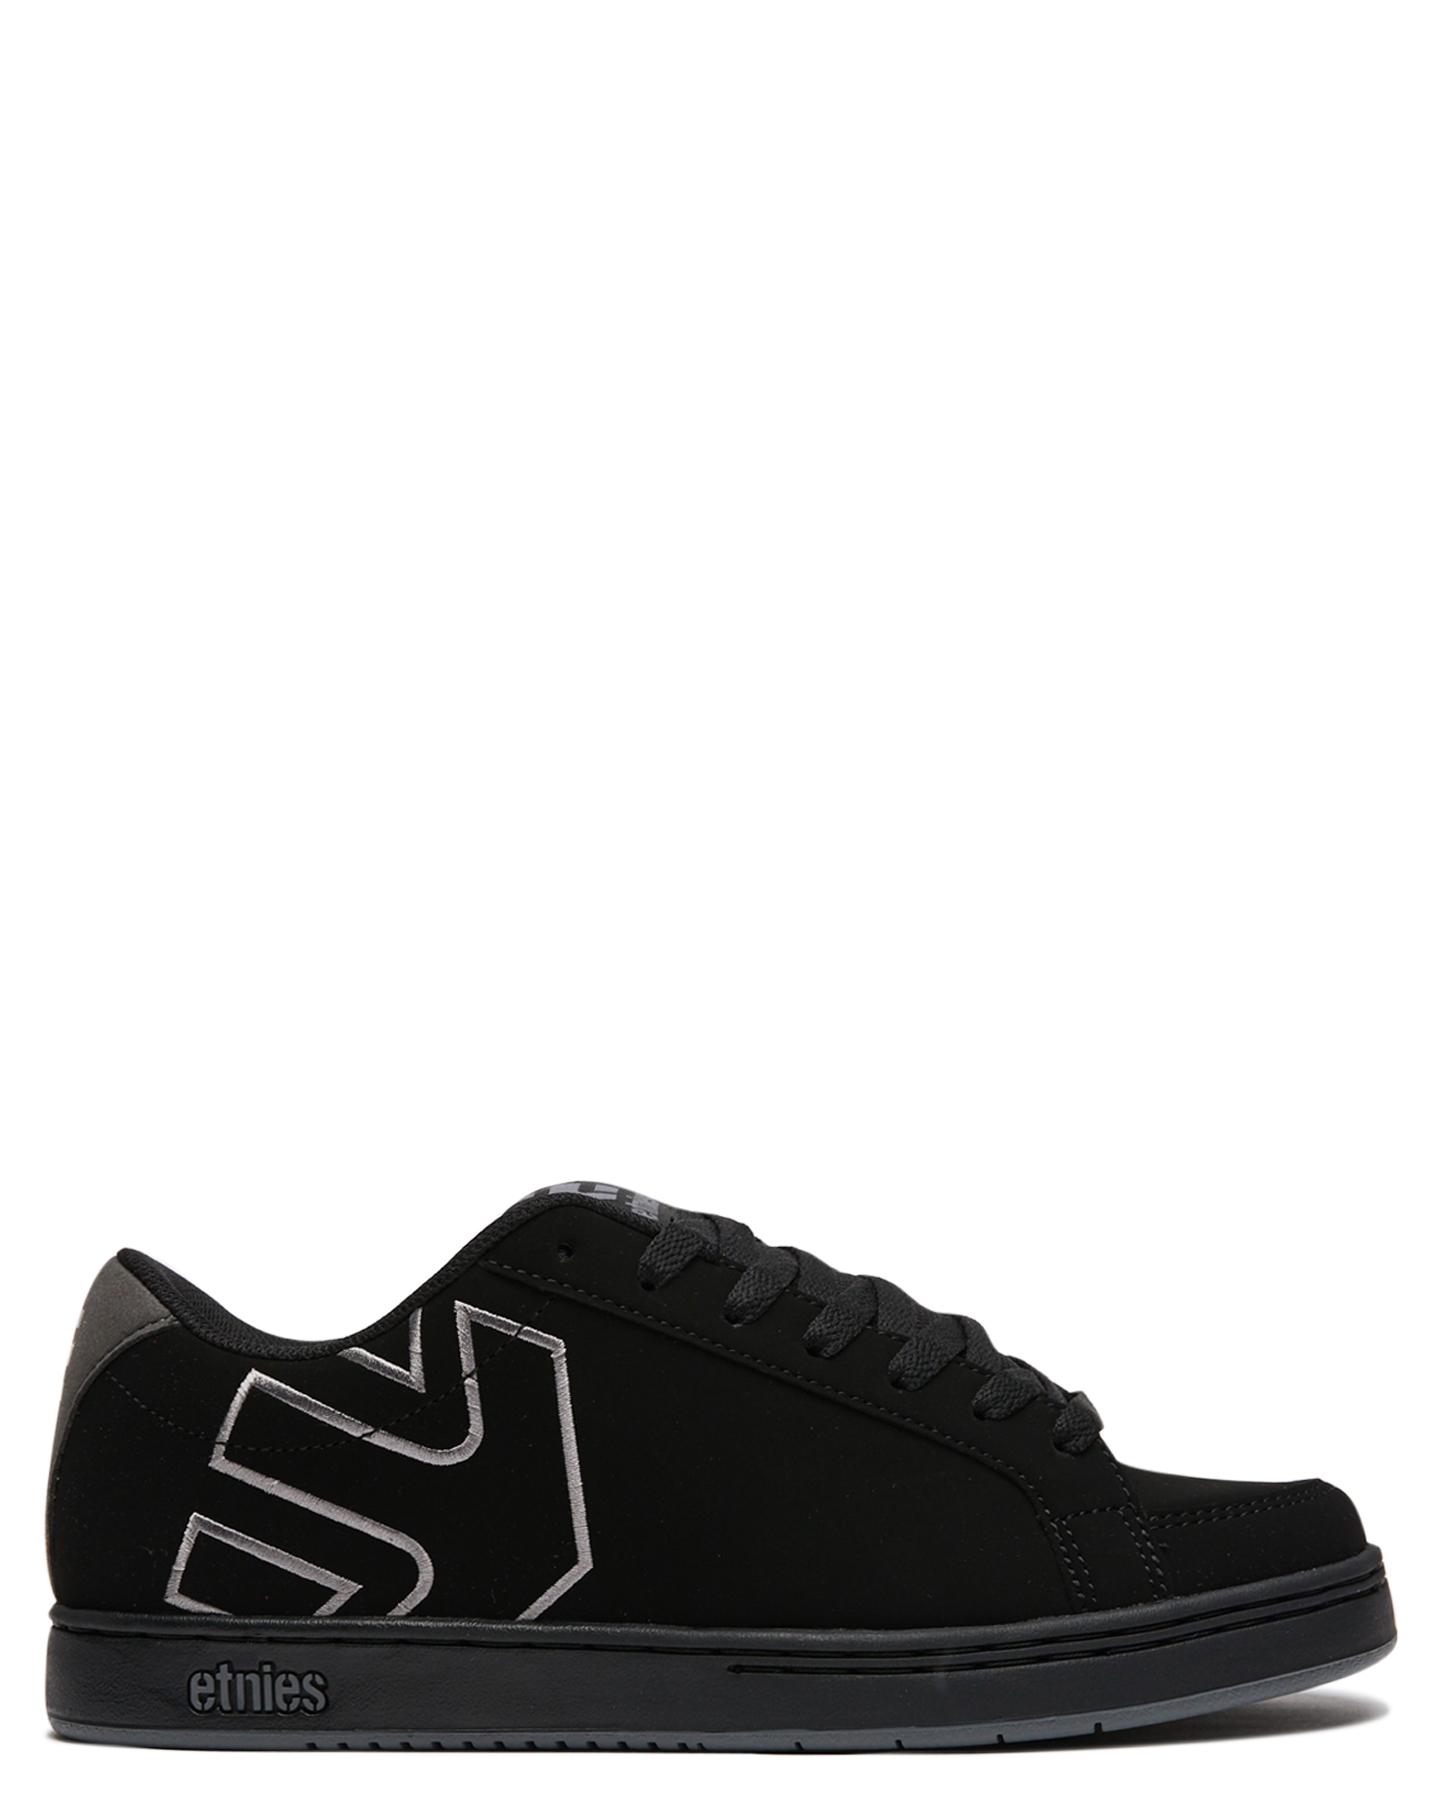 Etnies Mens Kingpin 2 Shoe Black Grey Black